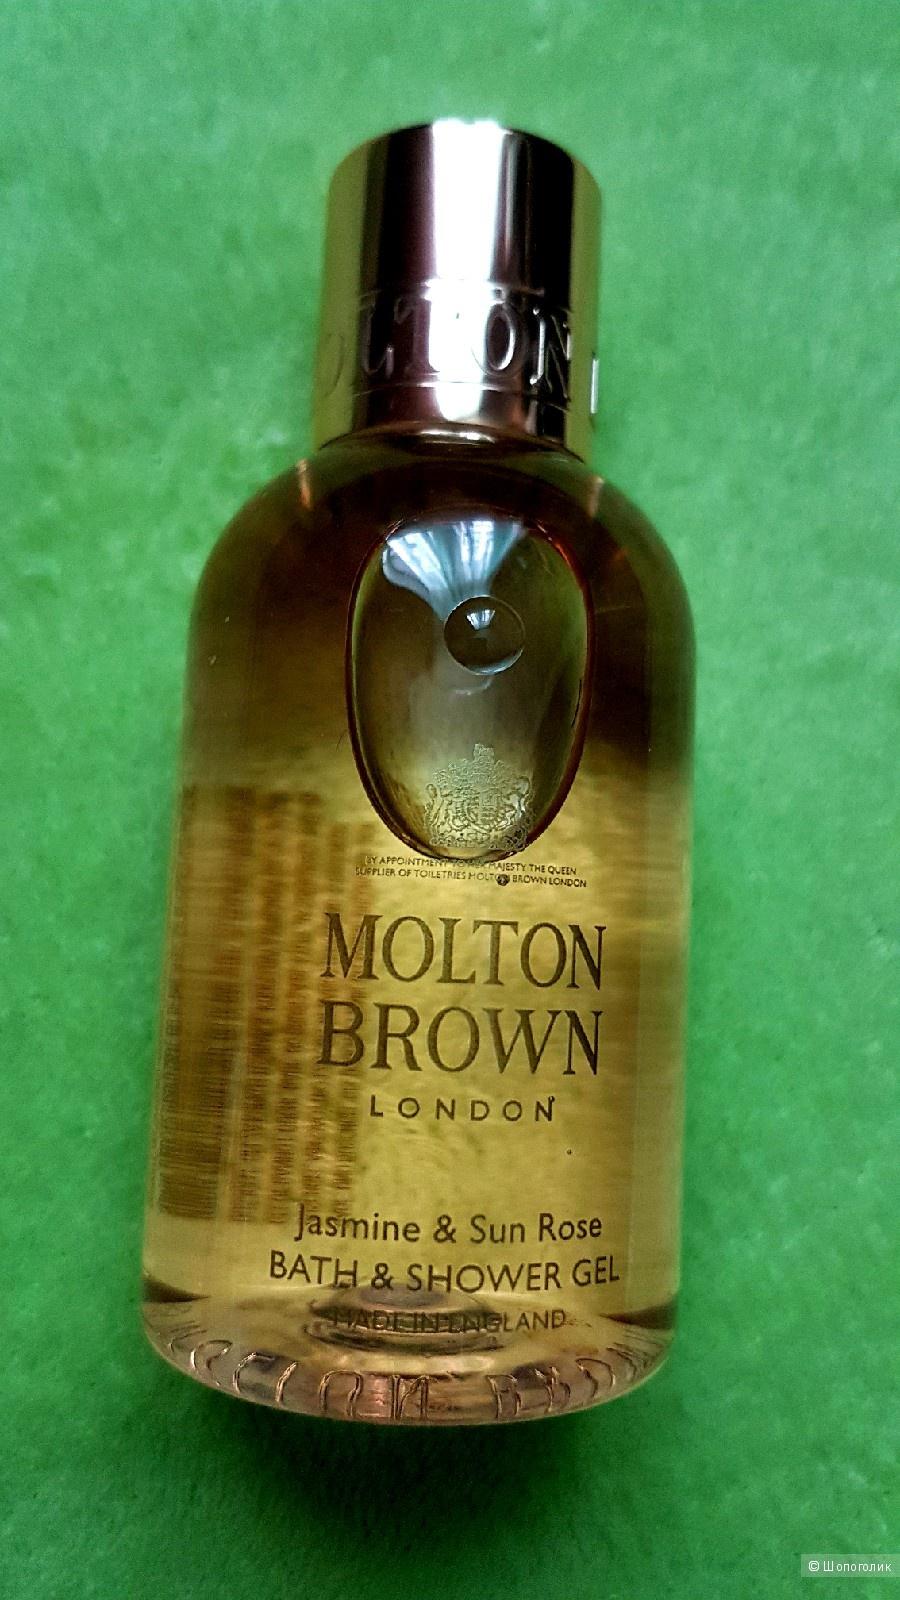 Molton Brown Jasmine & Sun Rose Bath & Shower Gel 100ml